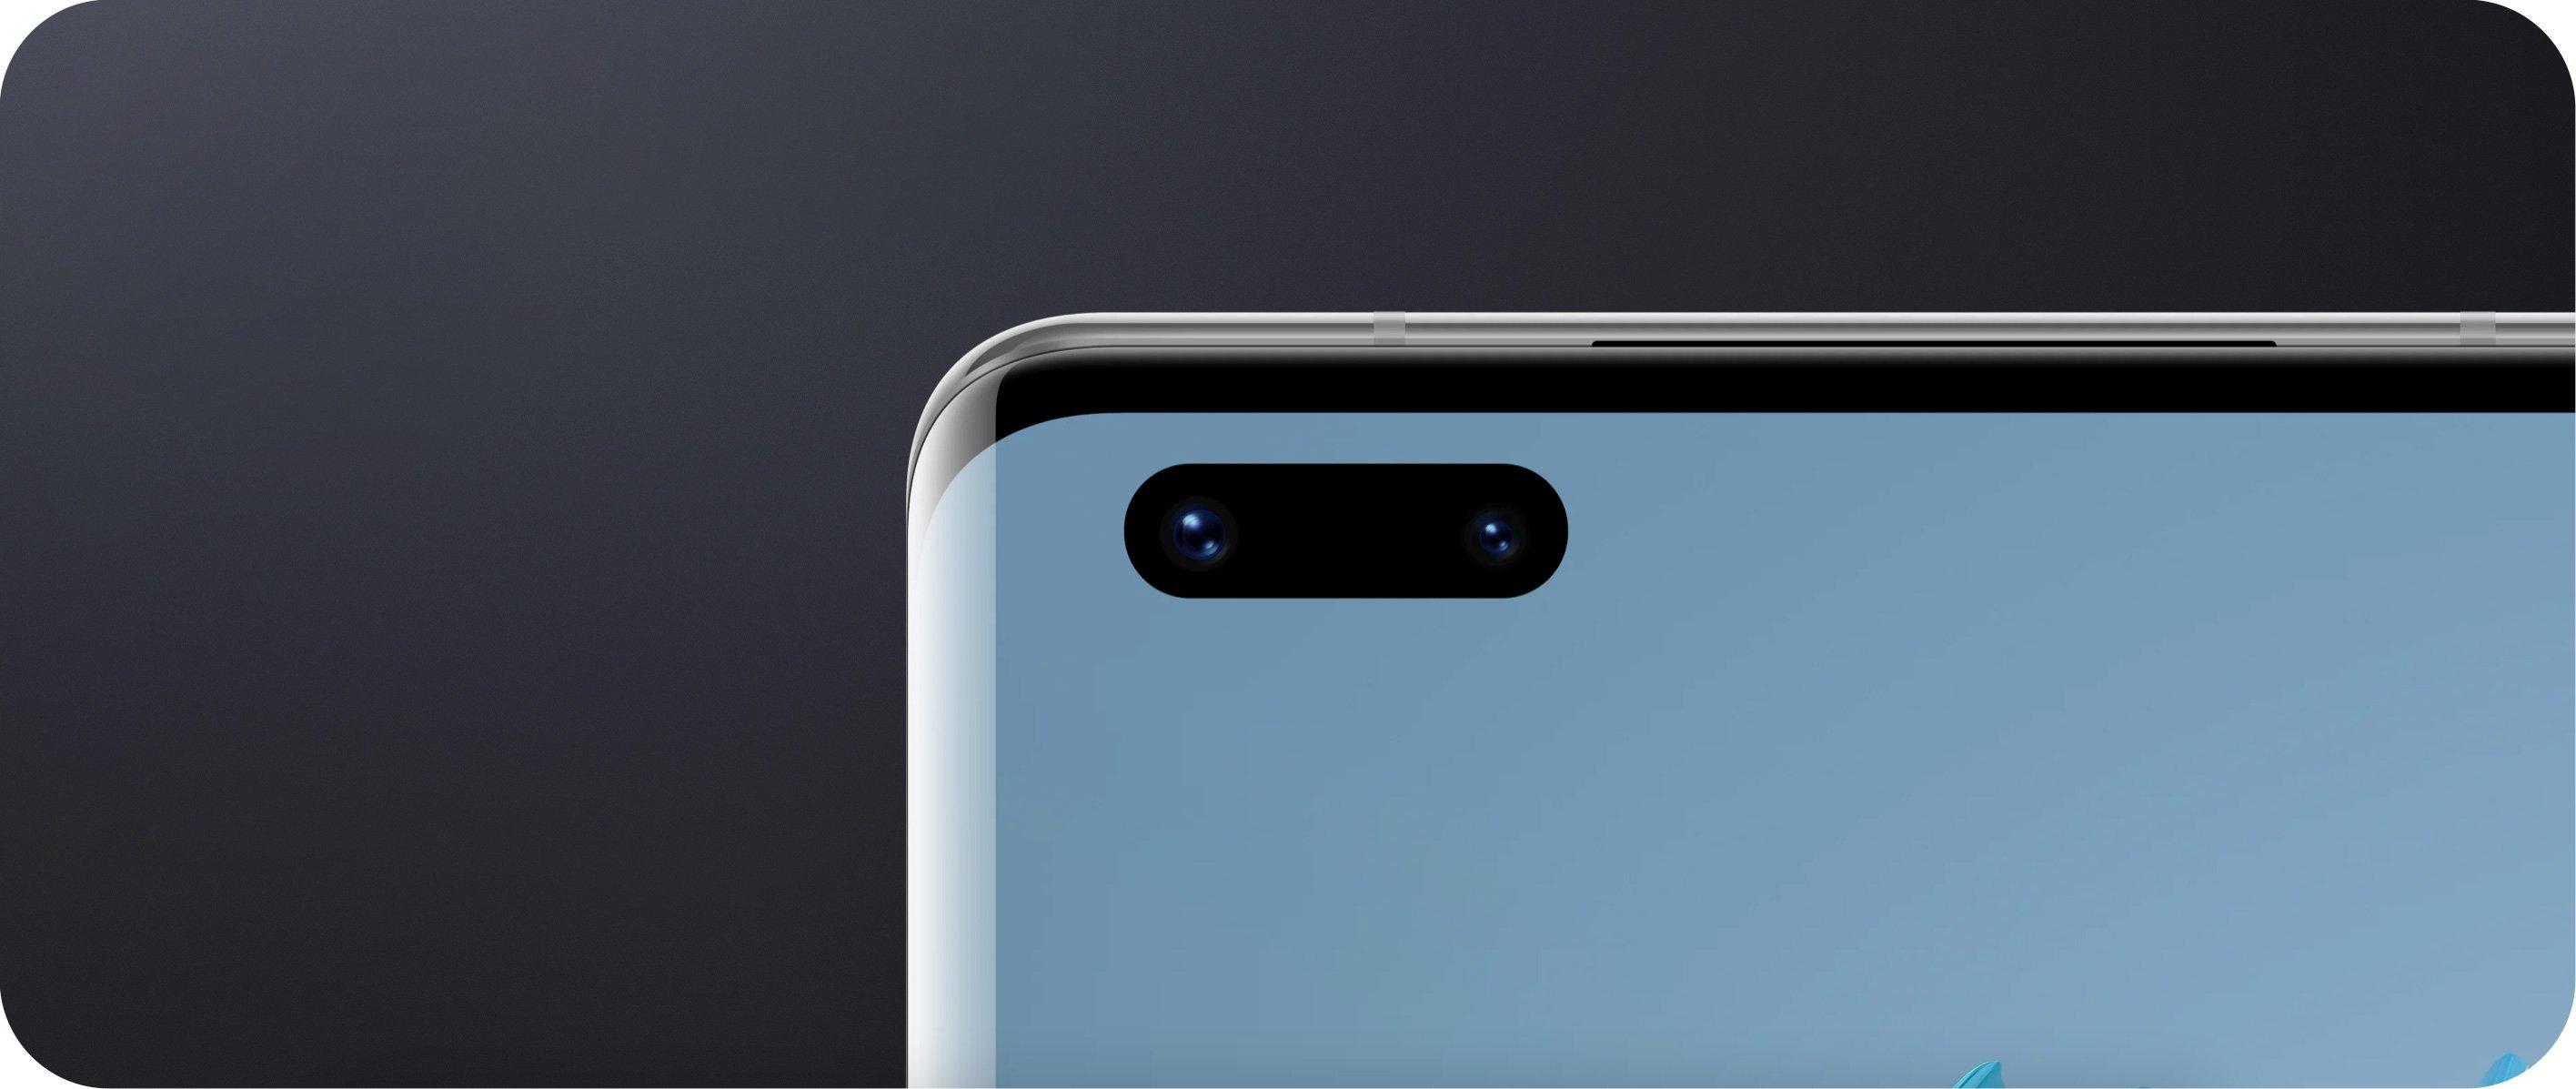 Huawei Mate 40 Pro (HMS) (5G)